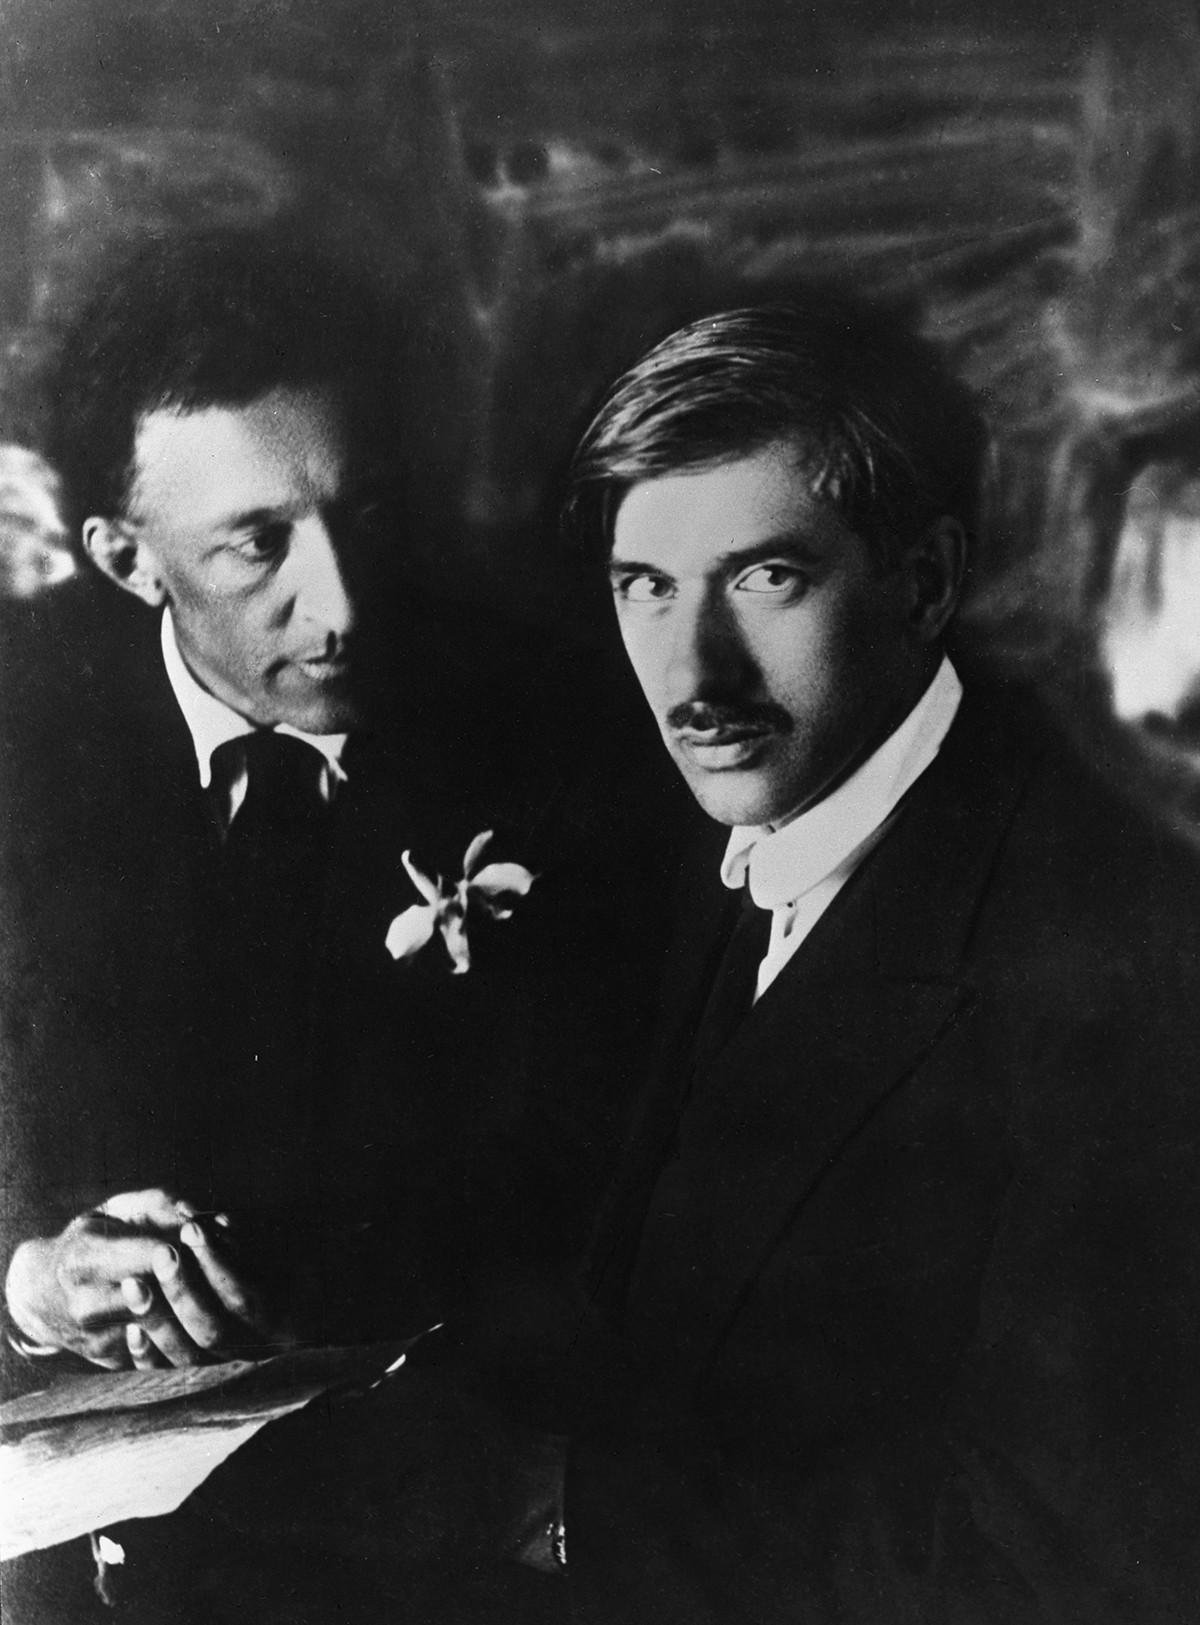 Aleksandr Blok e Korne Chukovskij, 1921